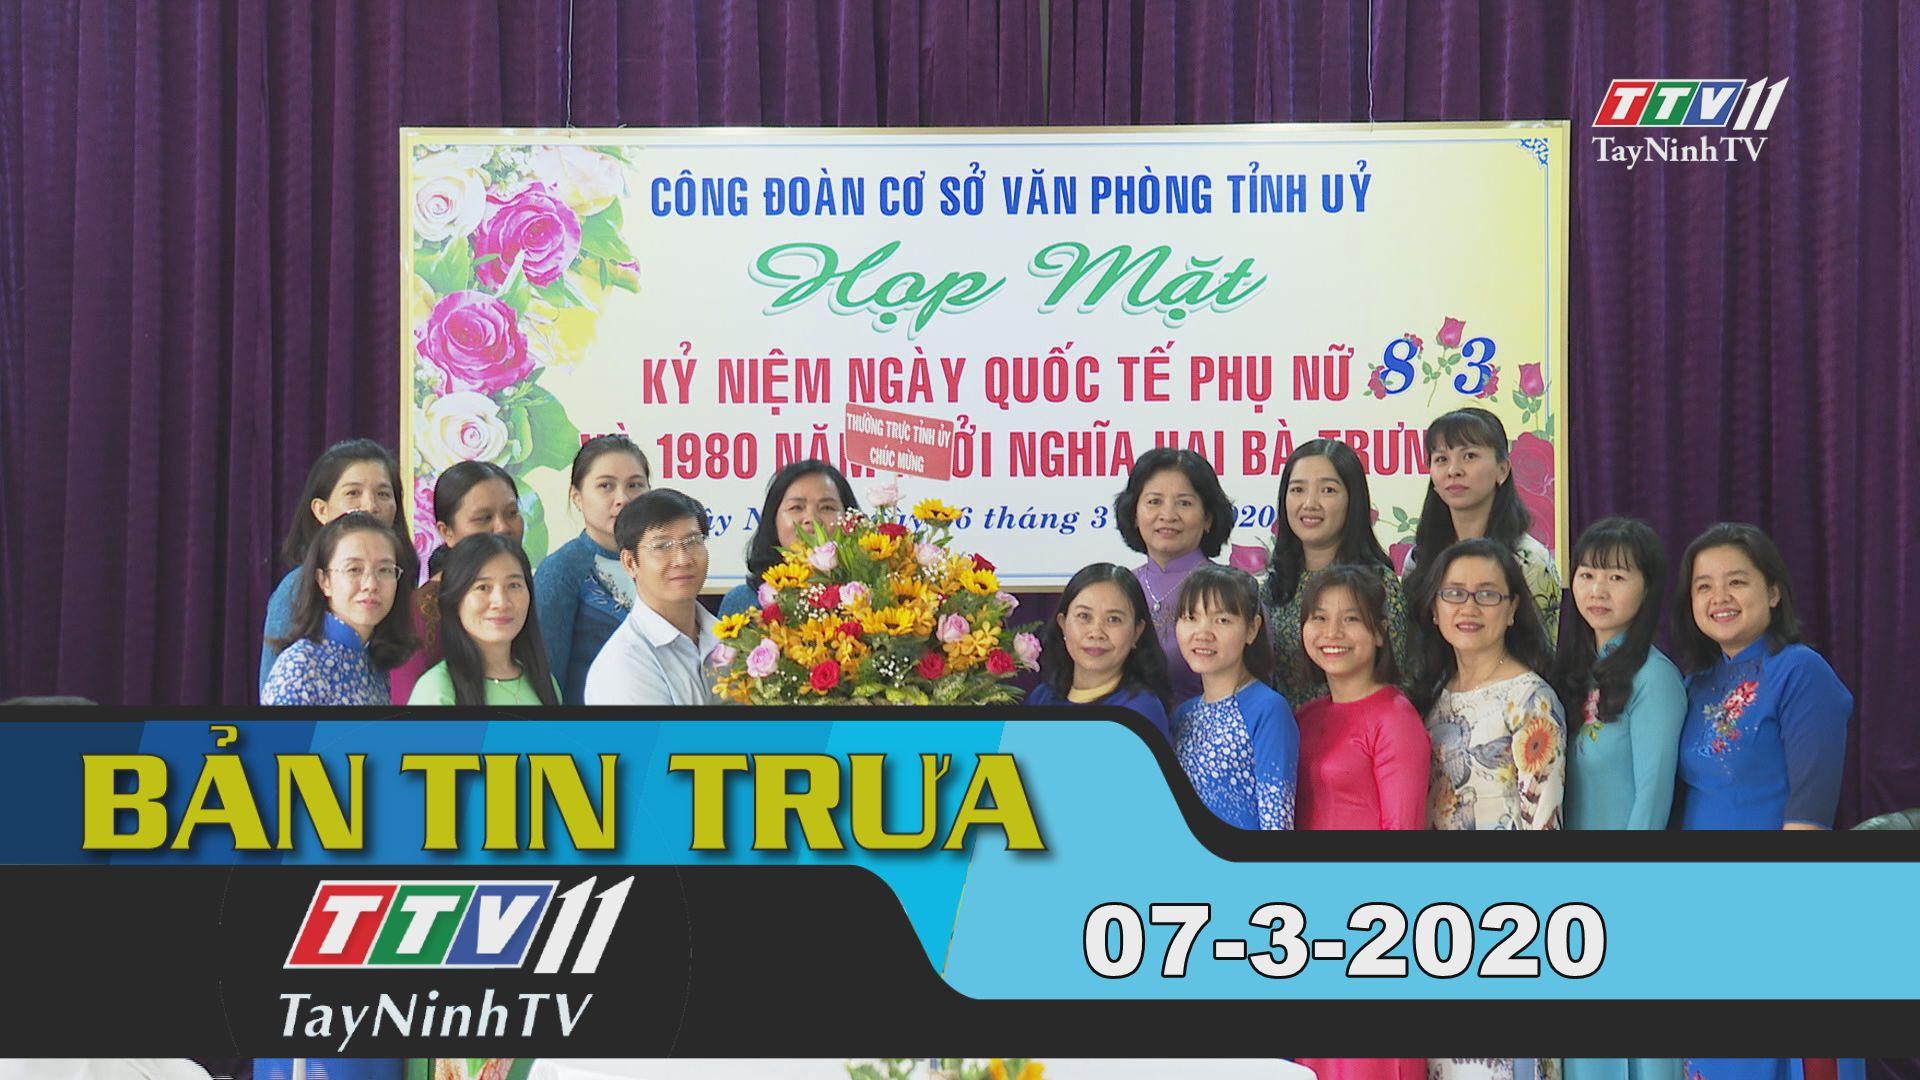 Bản tin trưa 07-3-2020 | Tin tức hôm nay | TayNinhTV